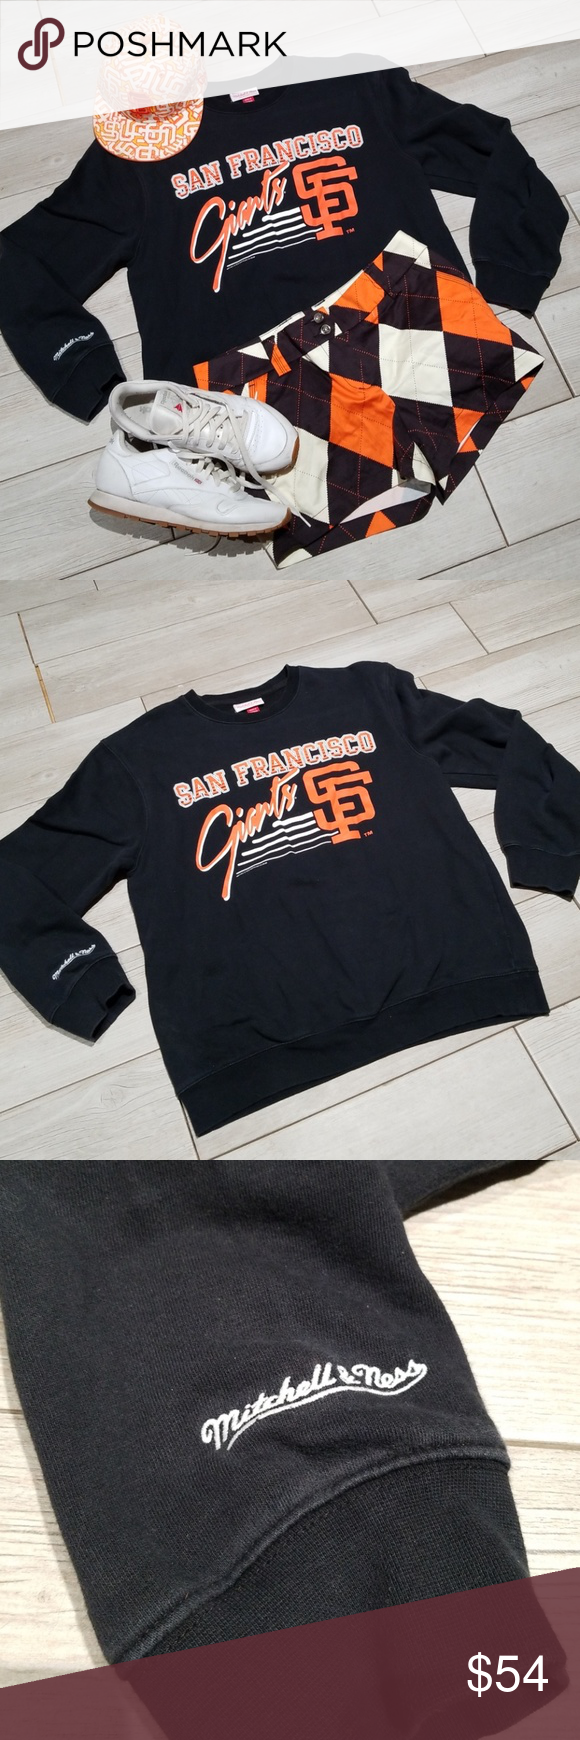 Mitchell Ness Sf Giants Vintage Sweatshirt Sz L Mitchell Ness Nostalgia Co Mlbp Size Large Black Crew N Vintage Sweatshirt Sweatshirts Giant Vintage [ 1740 x 580 Pixel ]